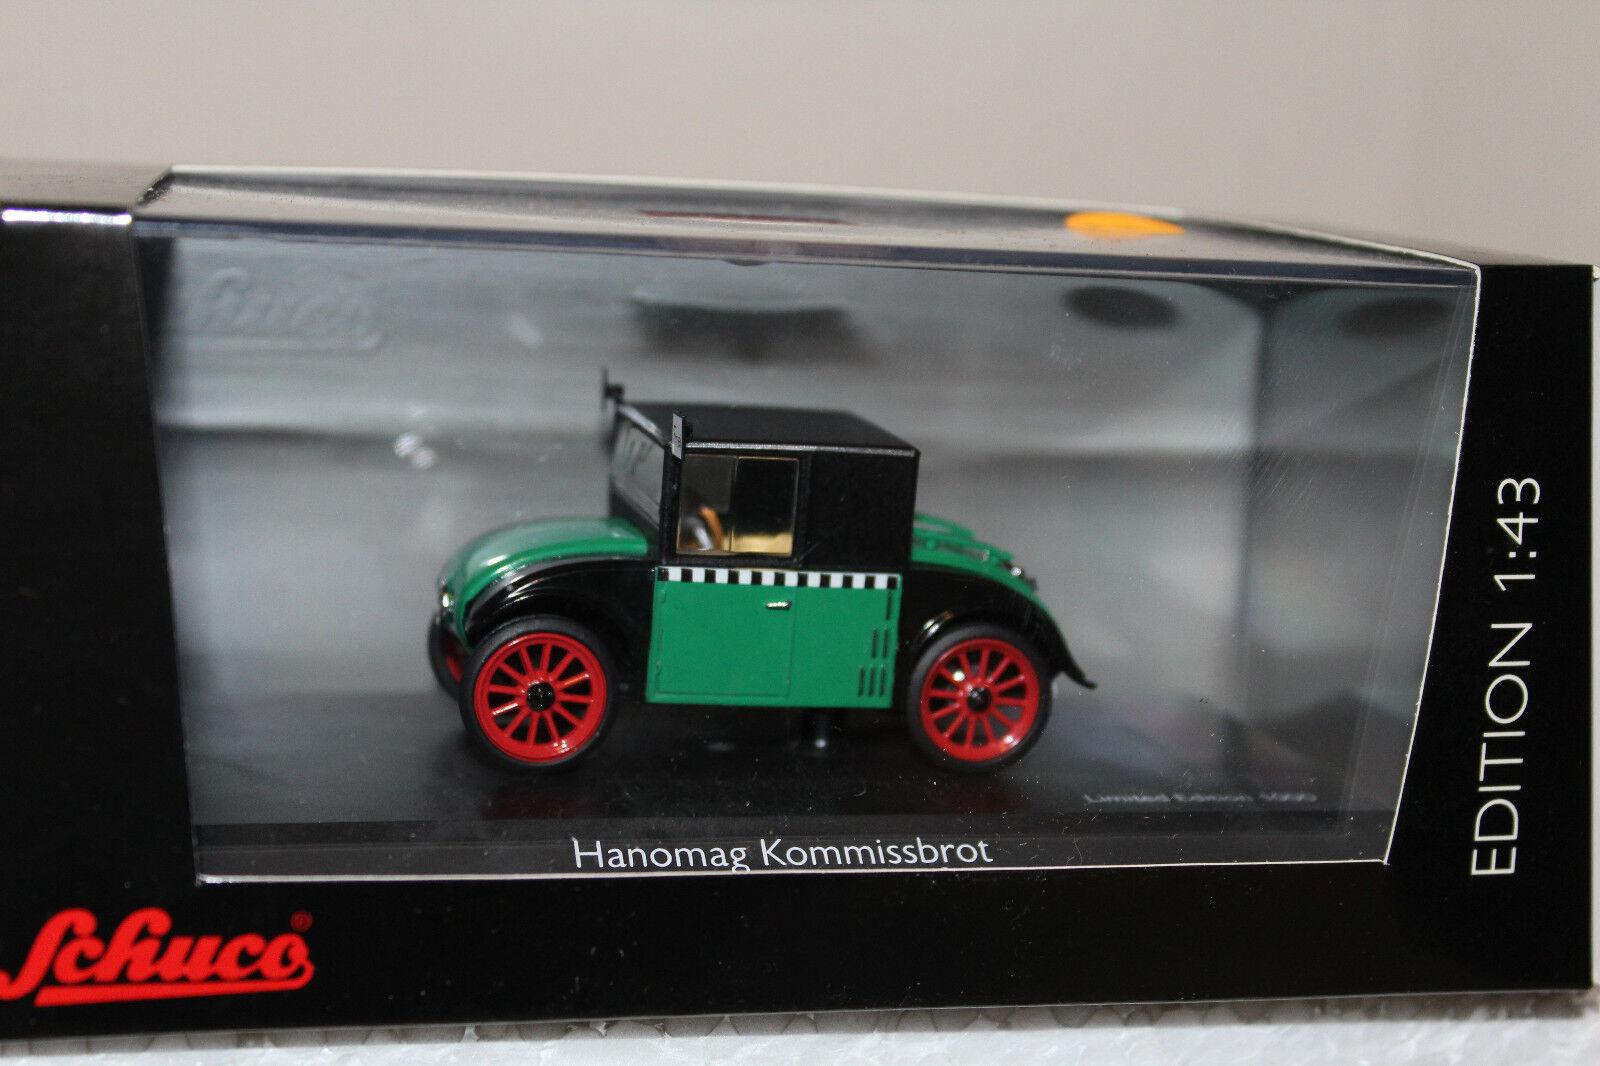 Schuco Hanomag Kommissbred  Taxi